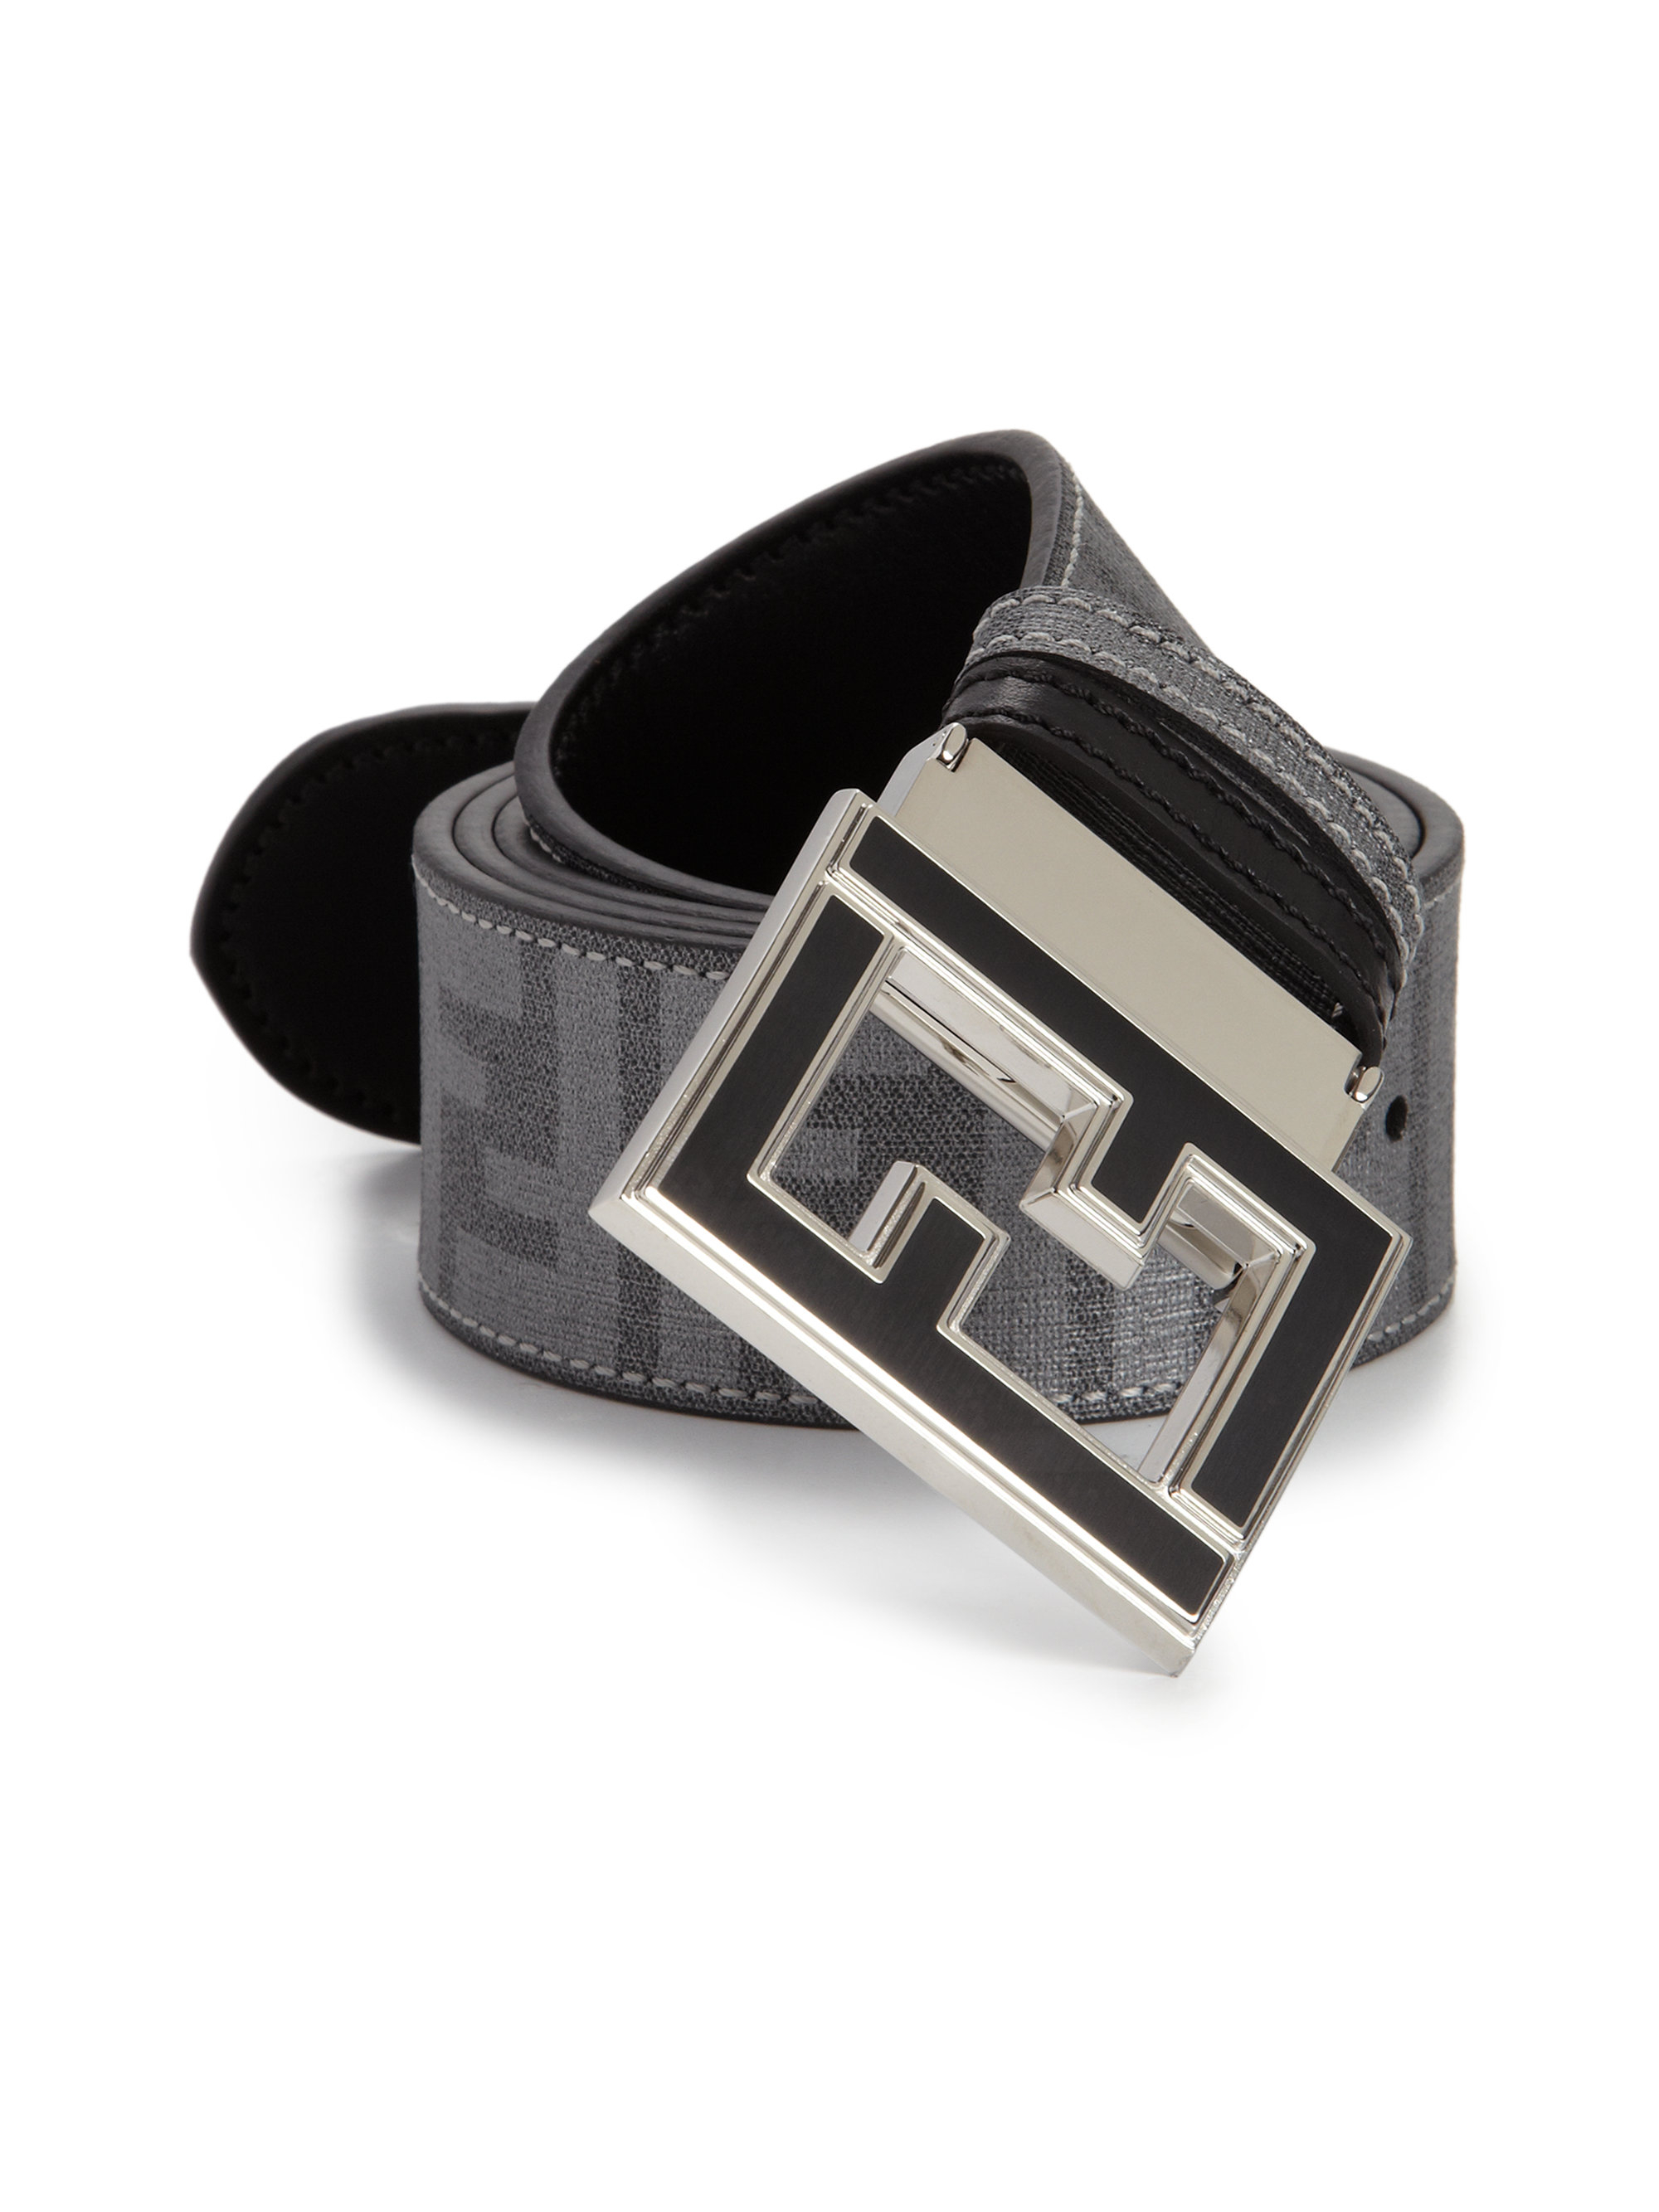 ... sweden lyst fendi logo college belt in gray for men 5473d 6a8fc 3b0c41446e5c2